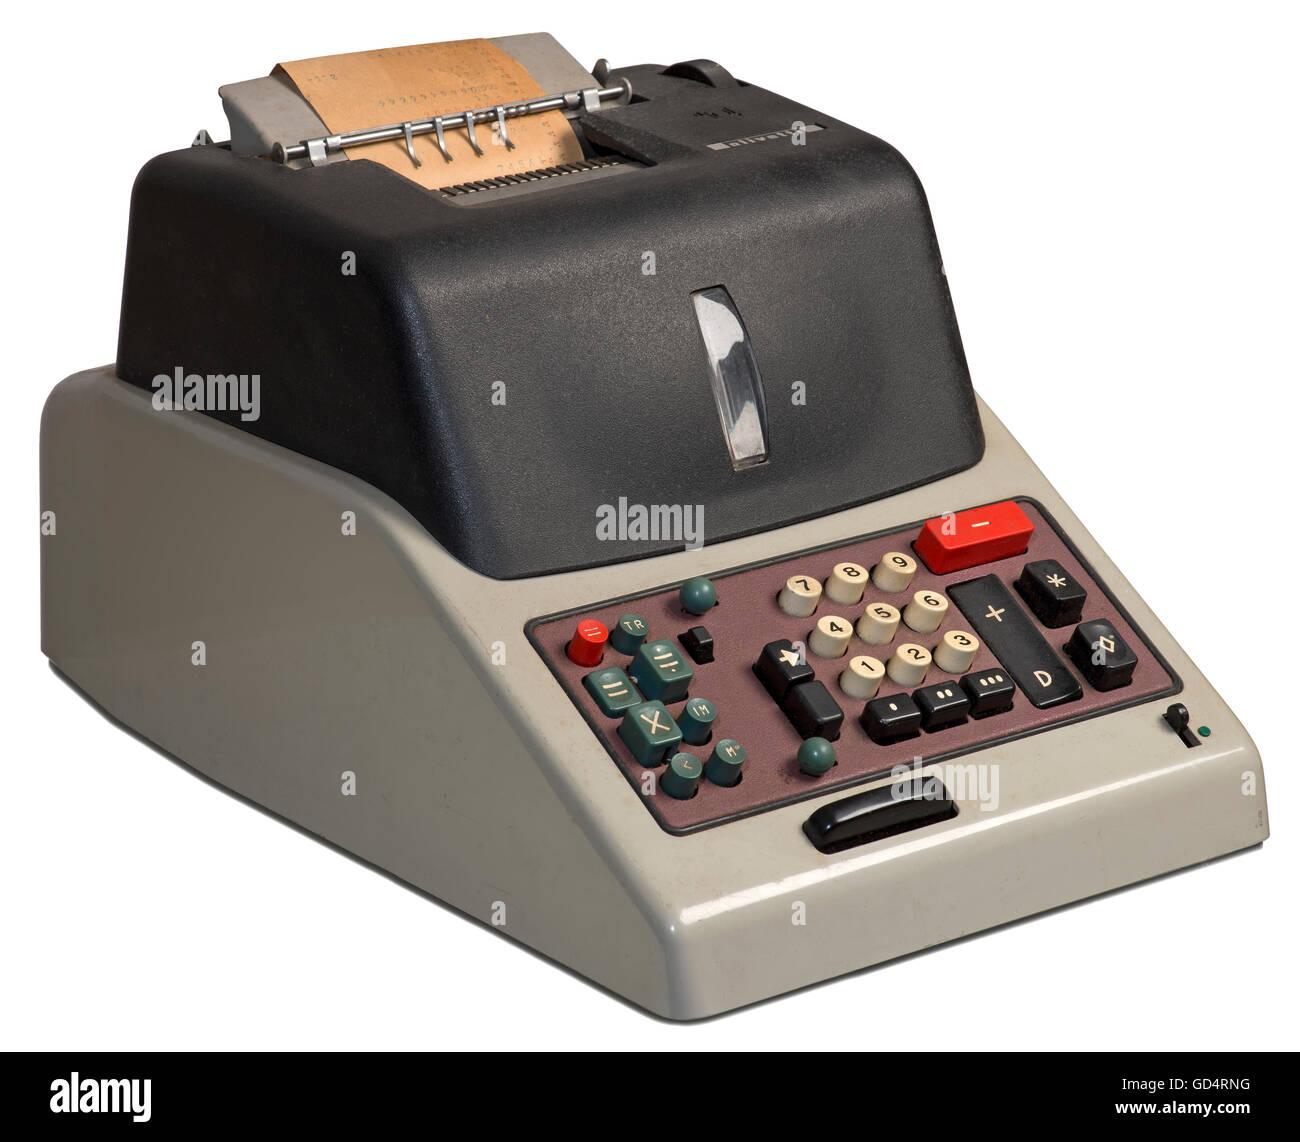 computer / electronics, calculating machine Olivetti Divisumma 24, constructor: Natale Capellaro (1902 - 1977), - Stock Image